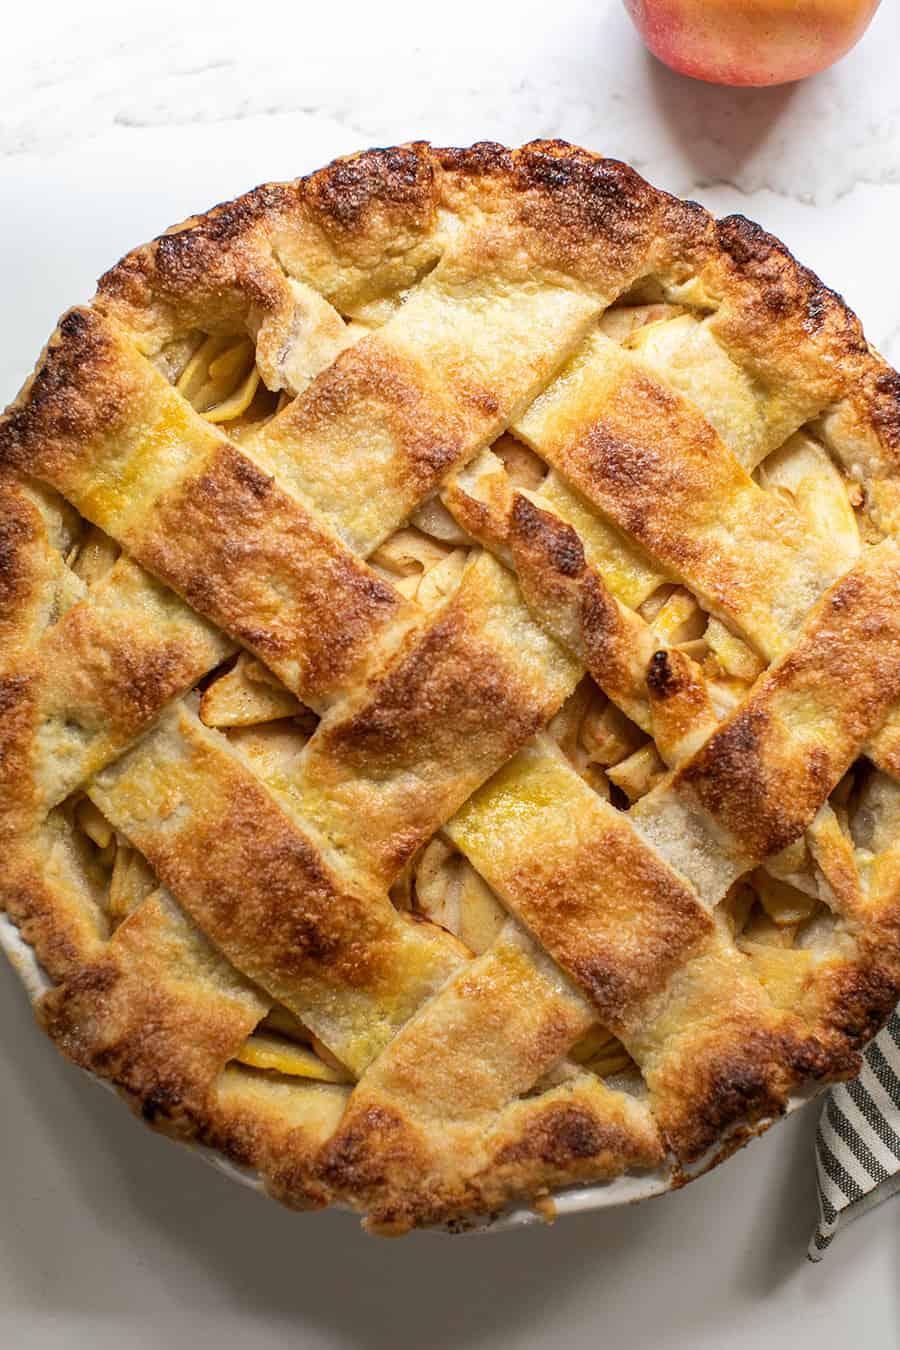 Homemade apple pie recipe with a golden brown pie crust top